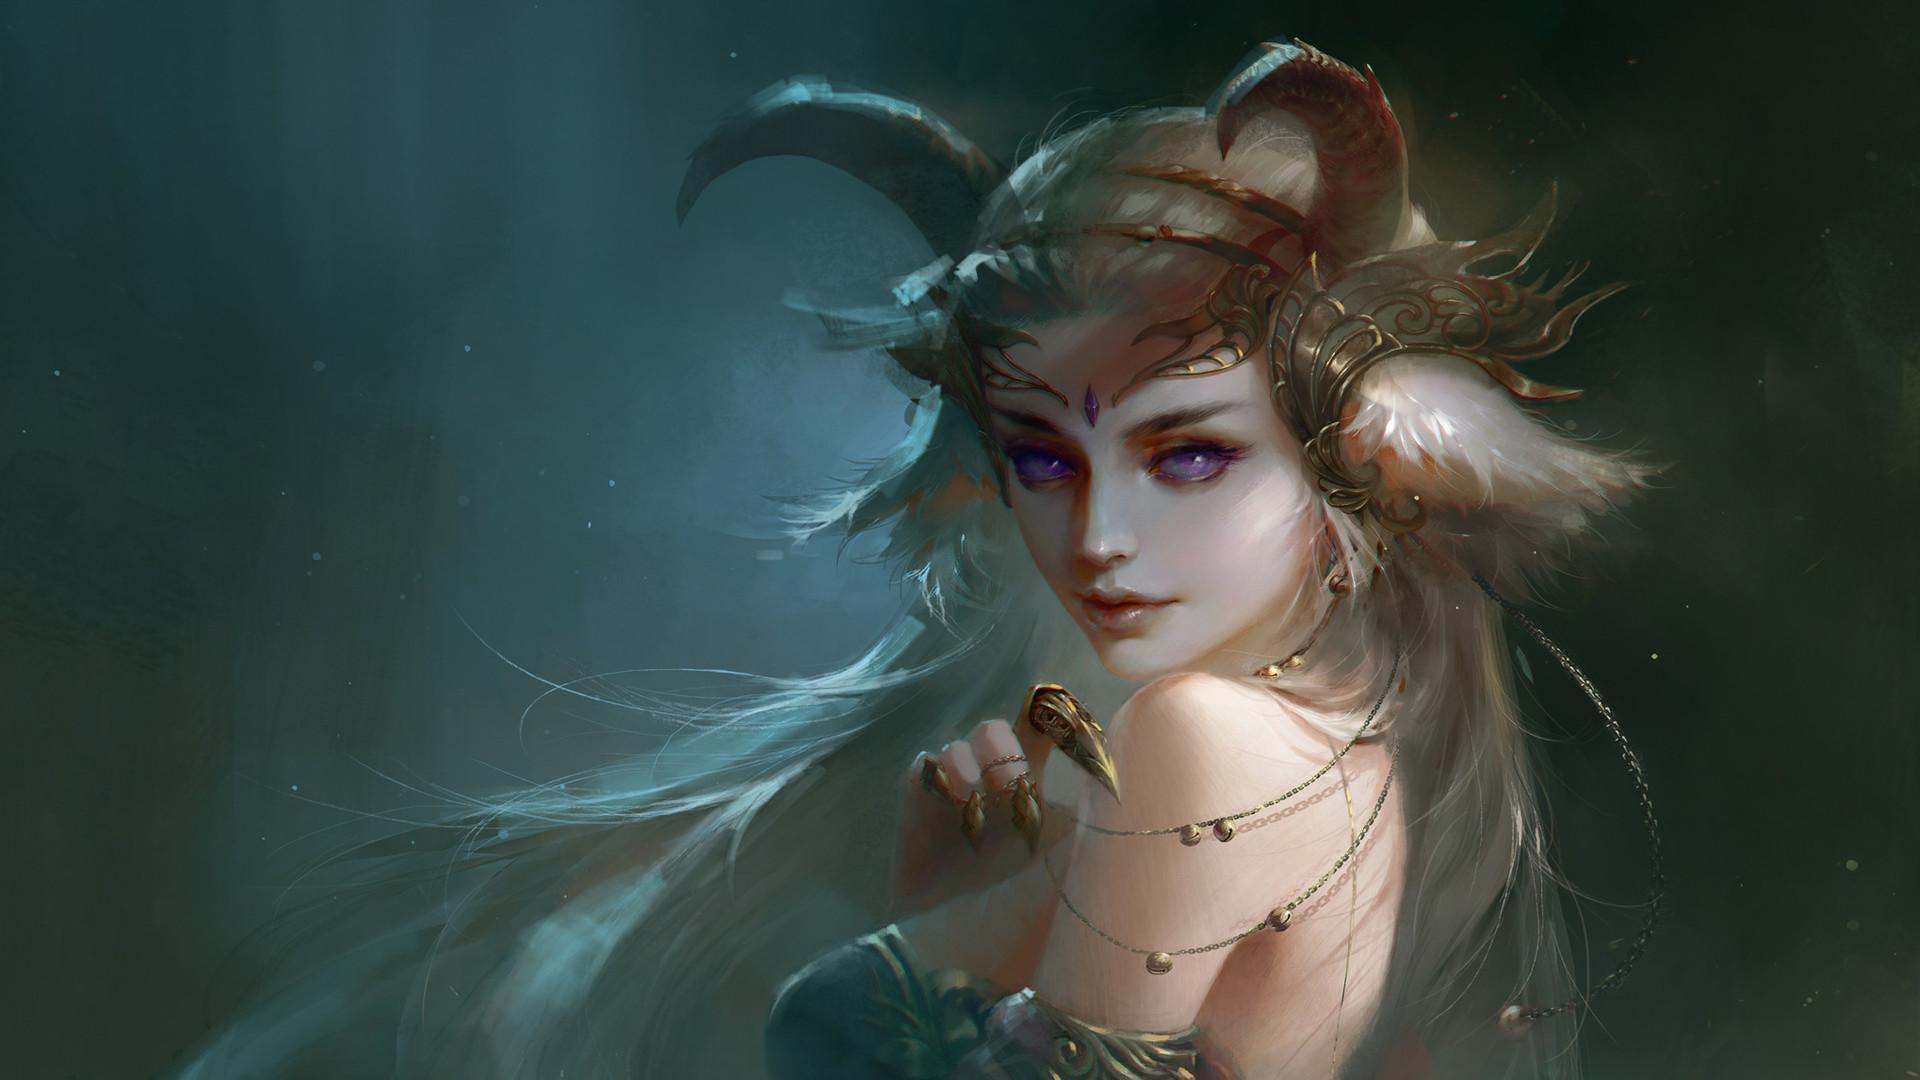 Res: 1920x1080, Demon Beautiful Girl (2048x1152 Resolution)